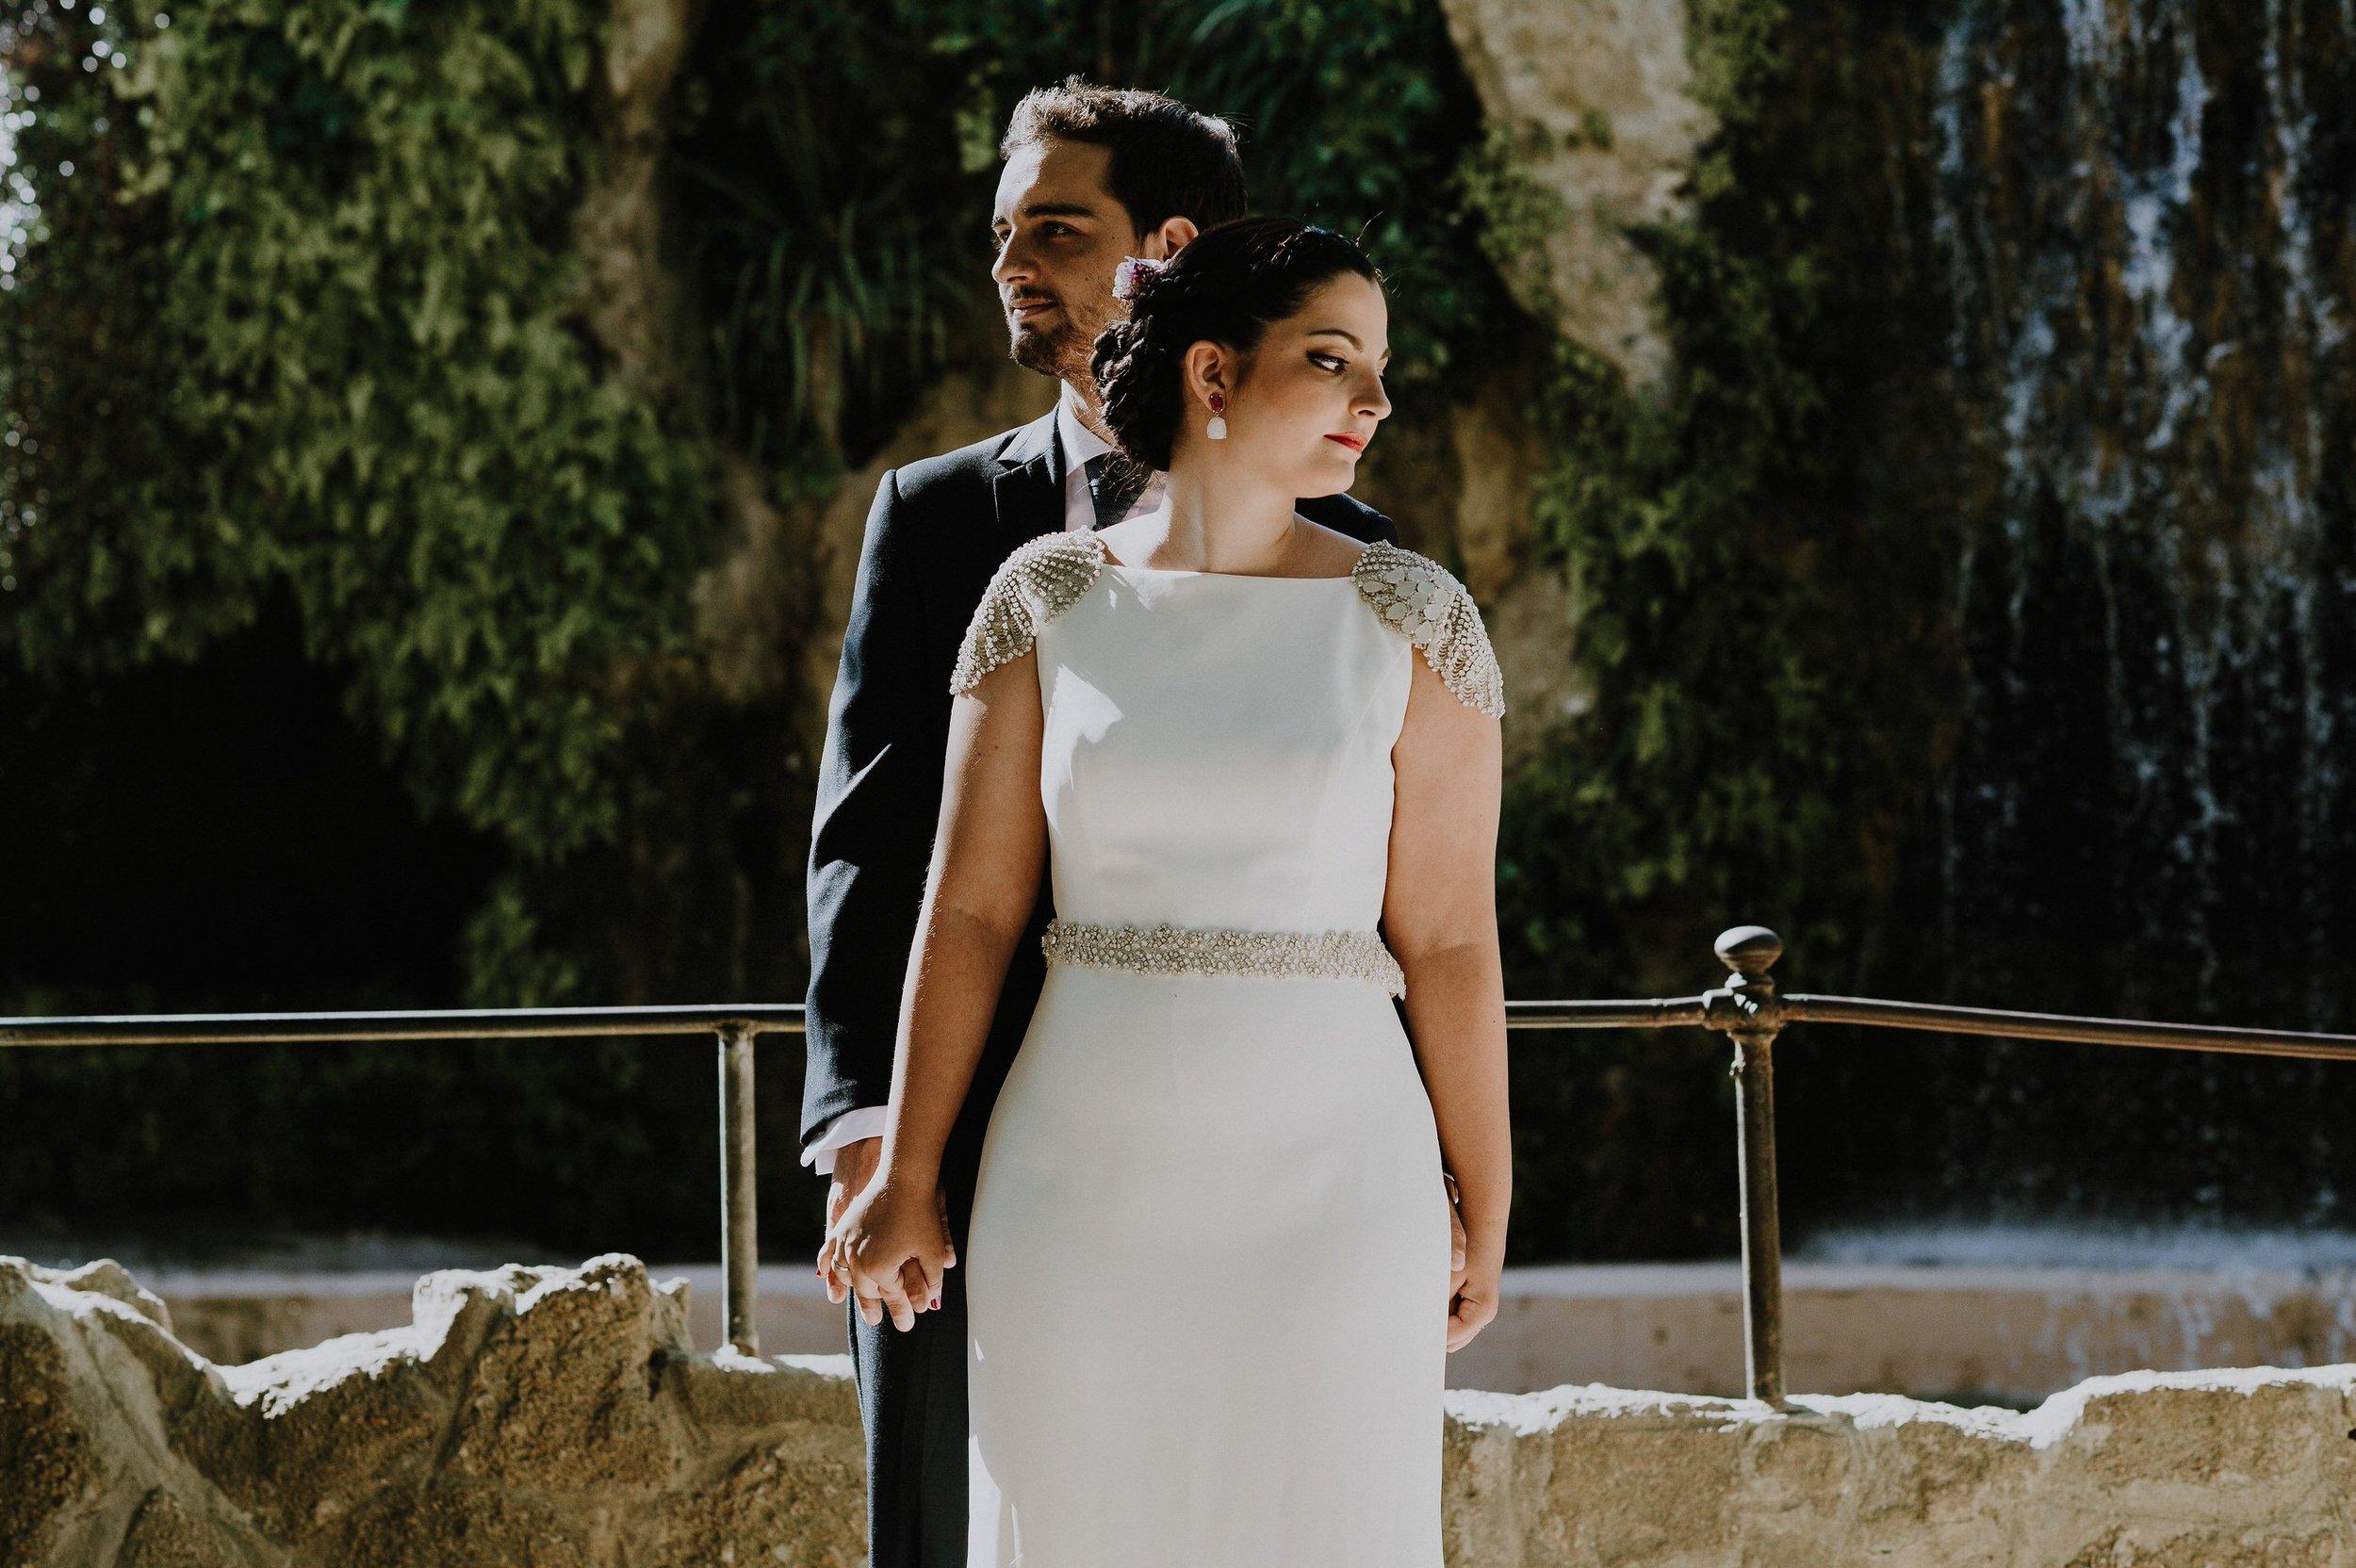 Laura & Rubén - boda en utrera - Santa clotilde- Manolo mayo - Fotografo de boda - Andrés Amarillo AAA_1075-Exposure (99).jpg